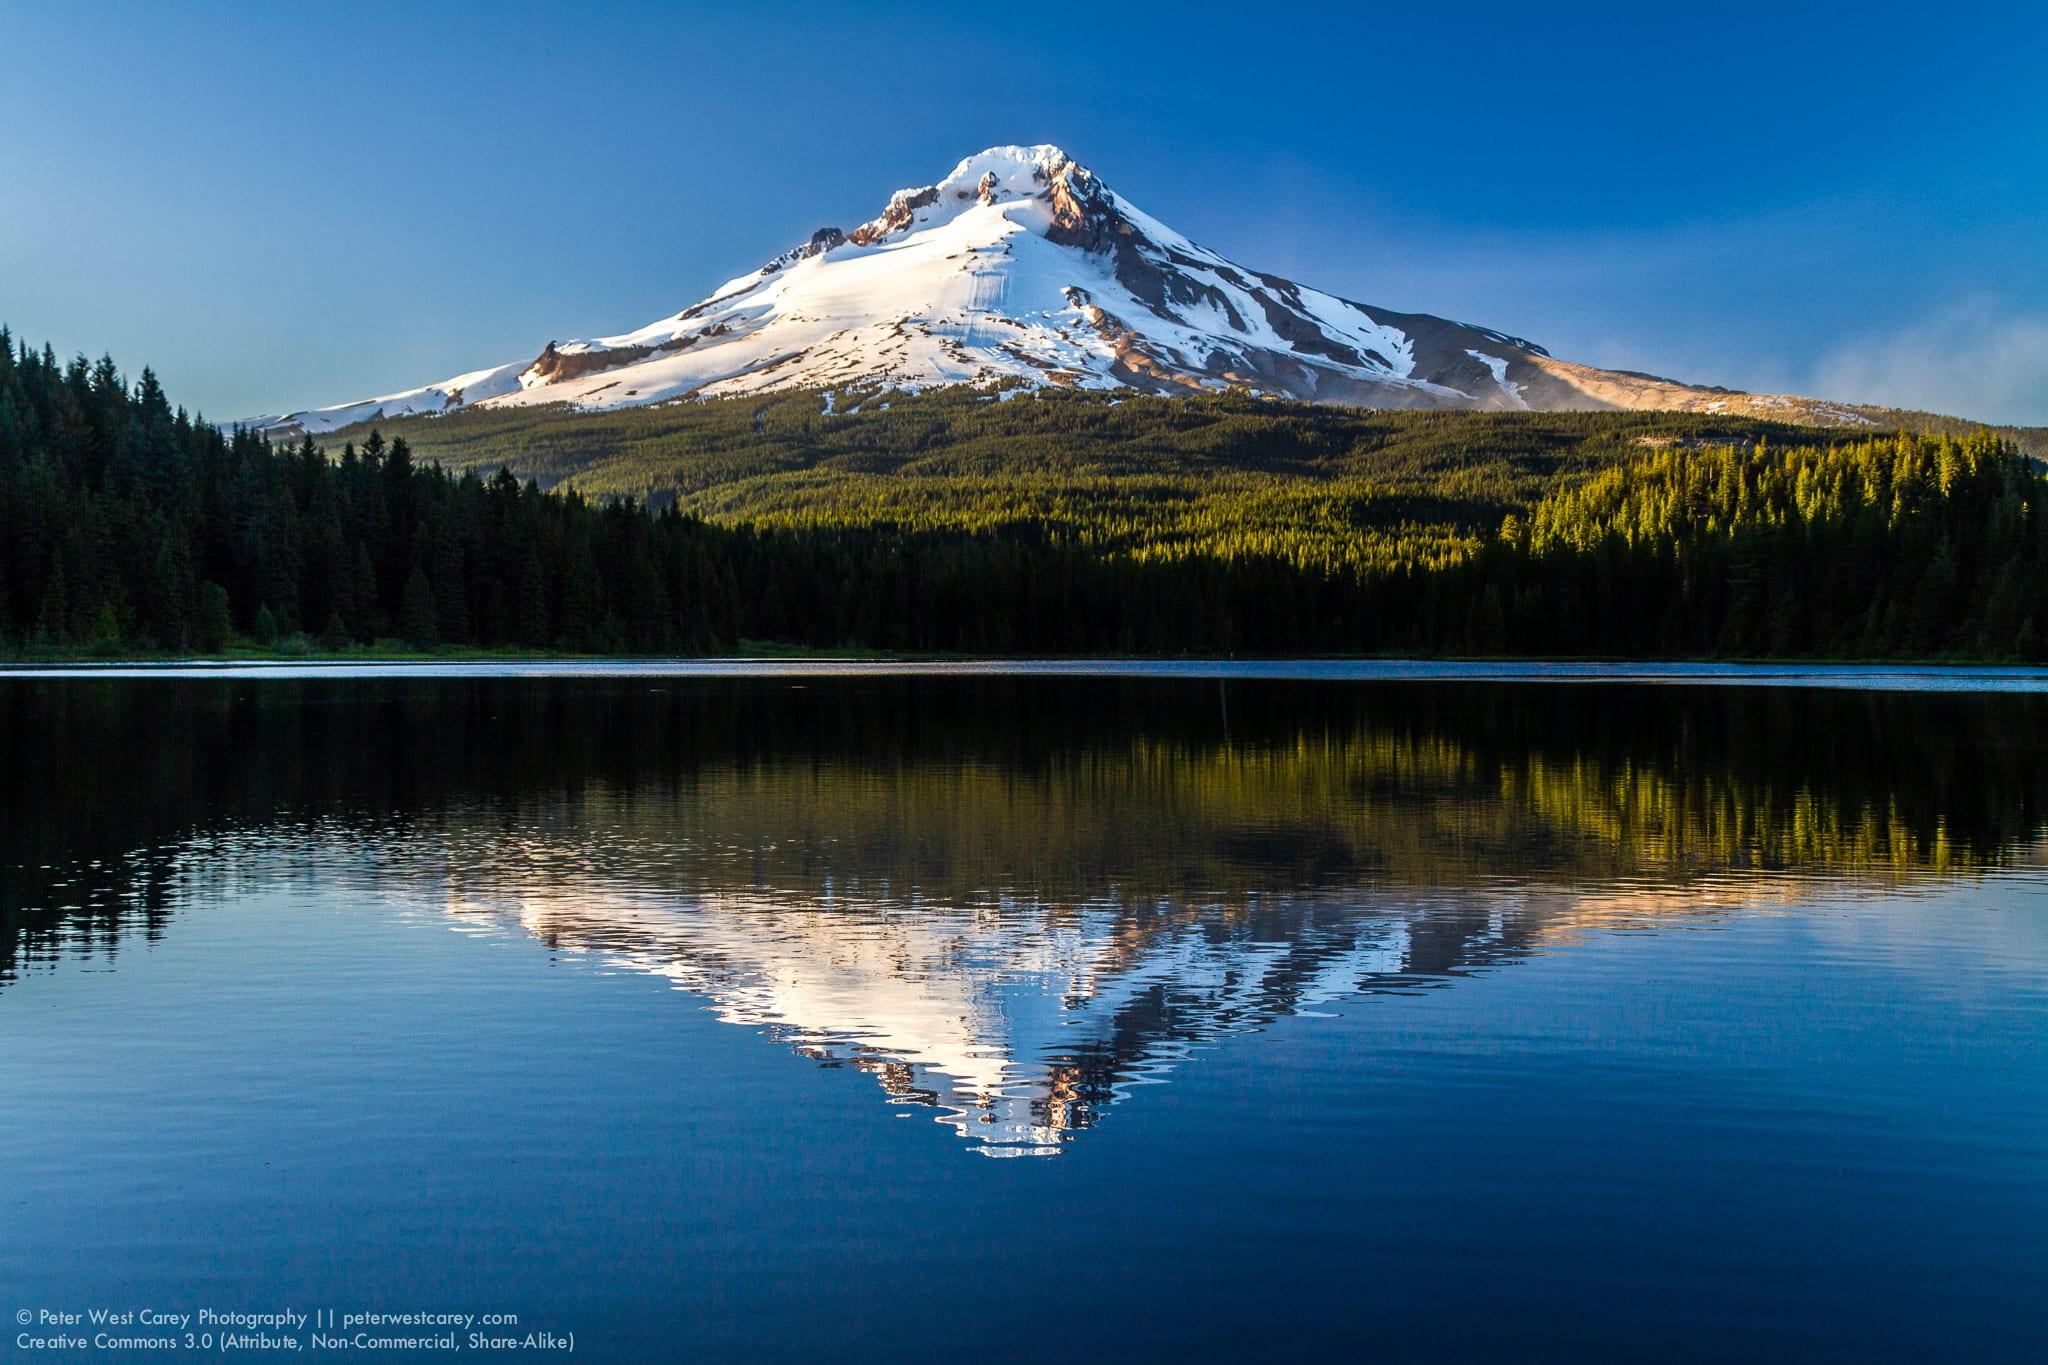 Mount Hood Reflected In Trillium Lake, Clackamas County, Oregon,